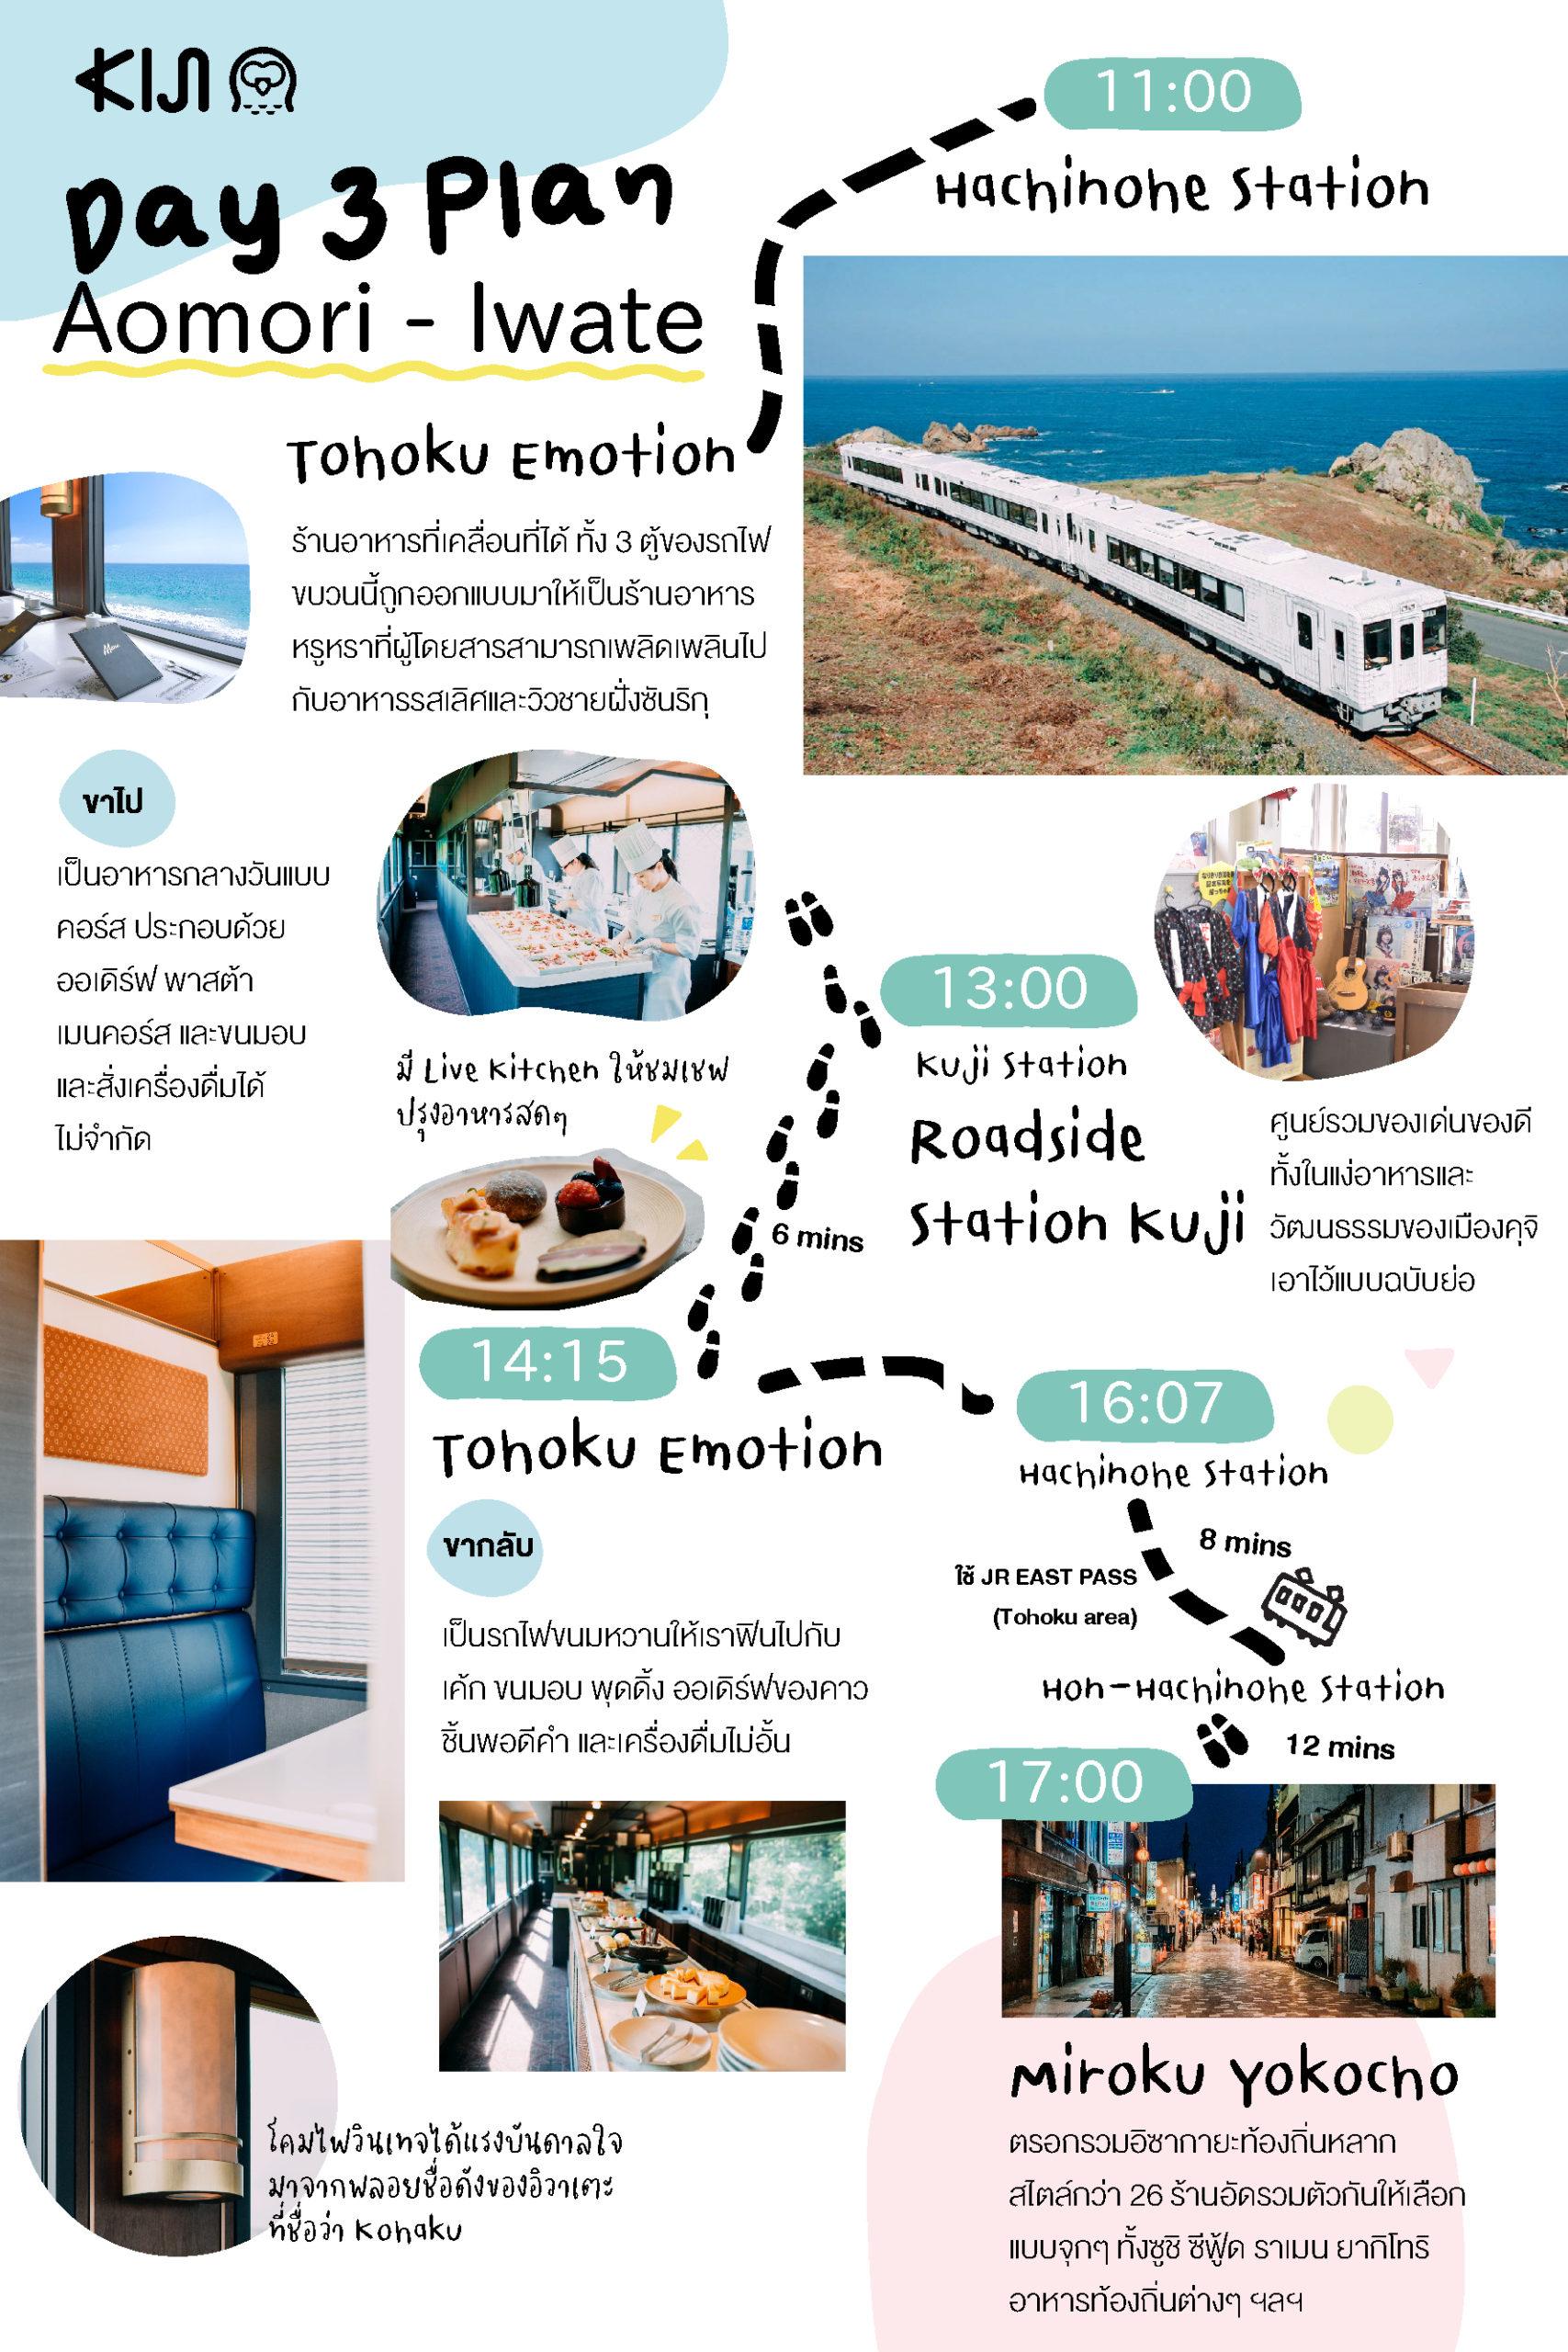 Day 3 : นั่งรถไฟ Tohoku Emotion ที่วิ่งระหว่าง อาโอโมริ (Aomori) กับ อิวาเตะ (Iwate)